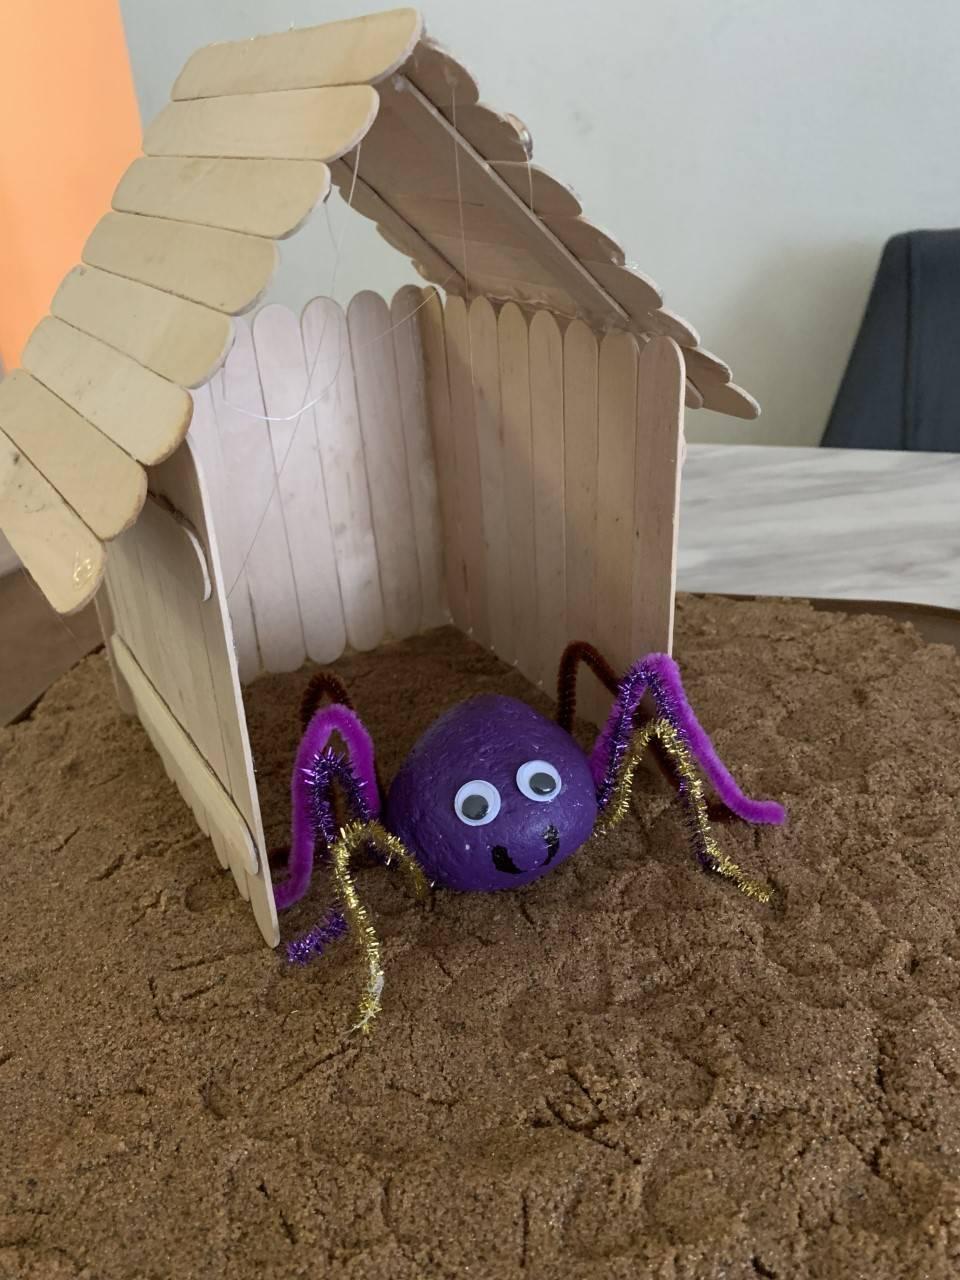 A pet rock sits inside it's house.